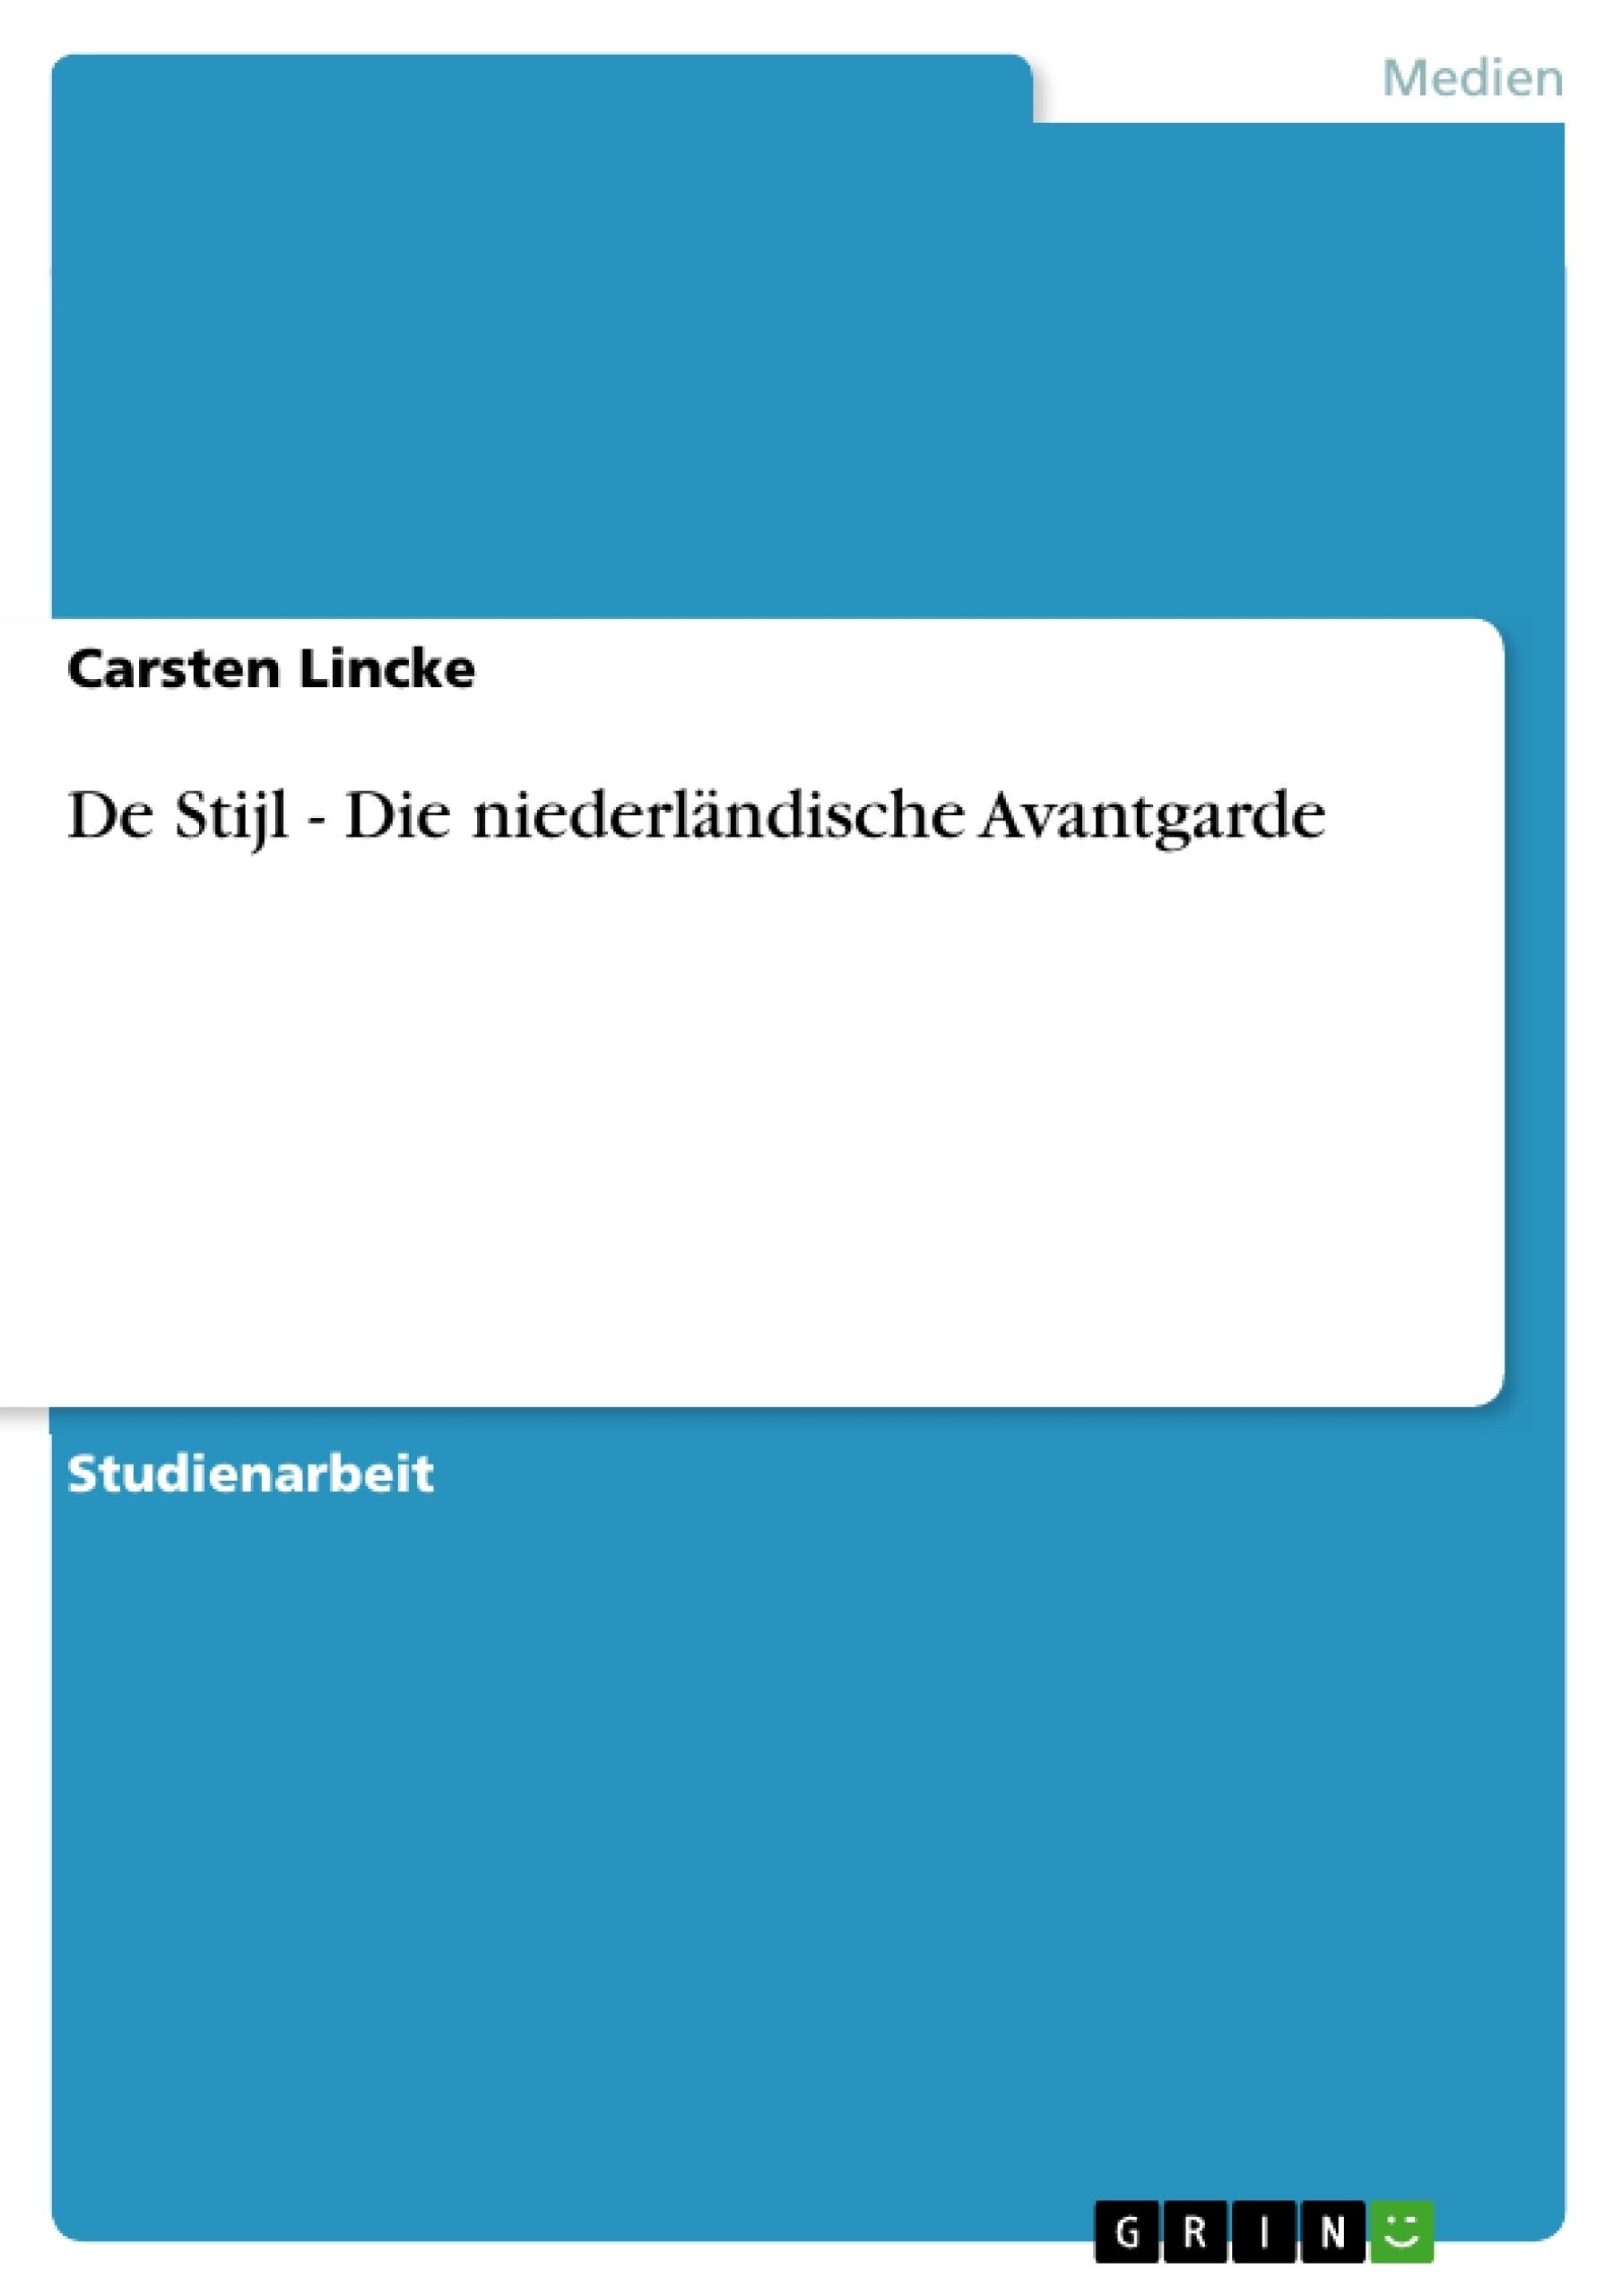 Titel: De Stijl - Die niederländische Avantgarde